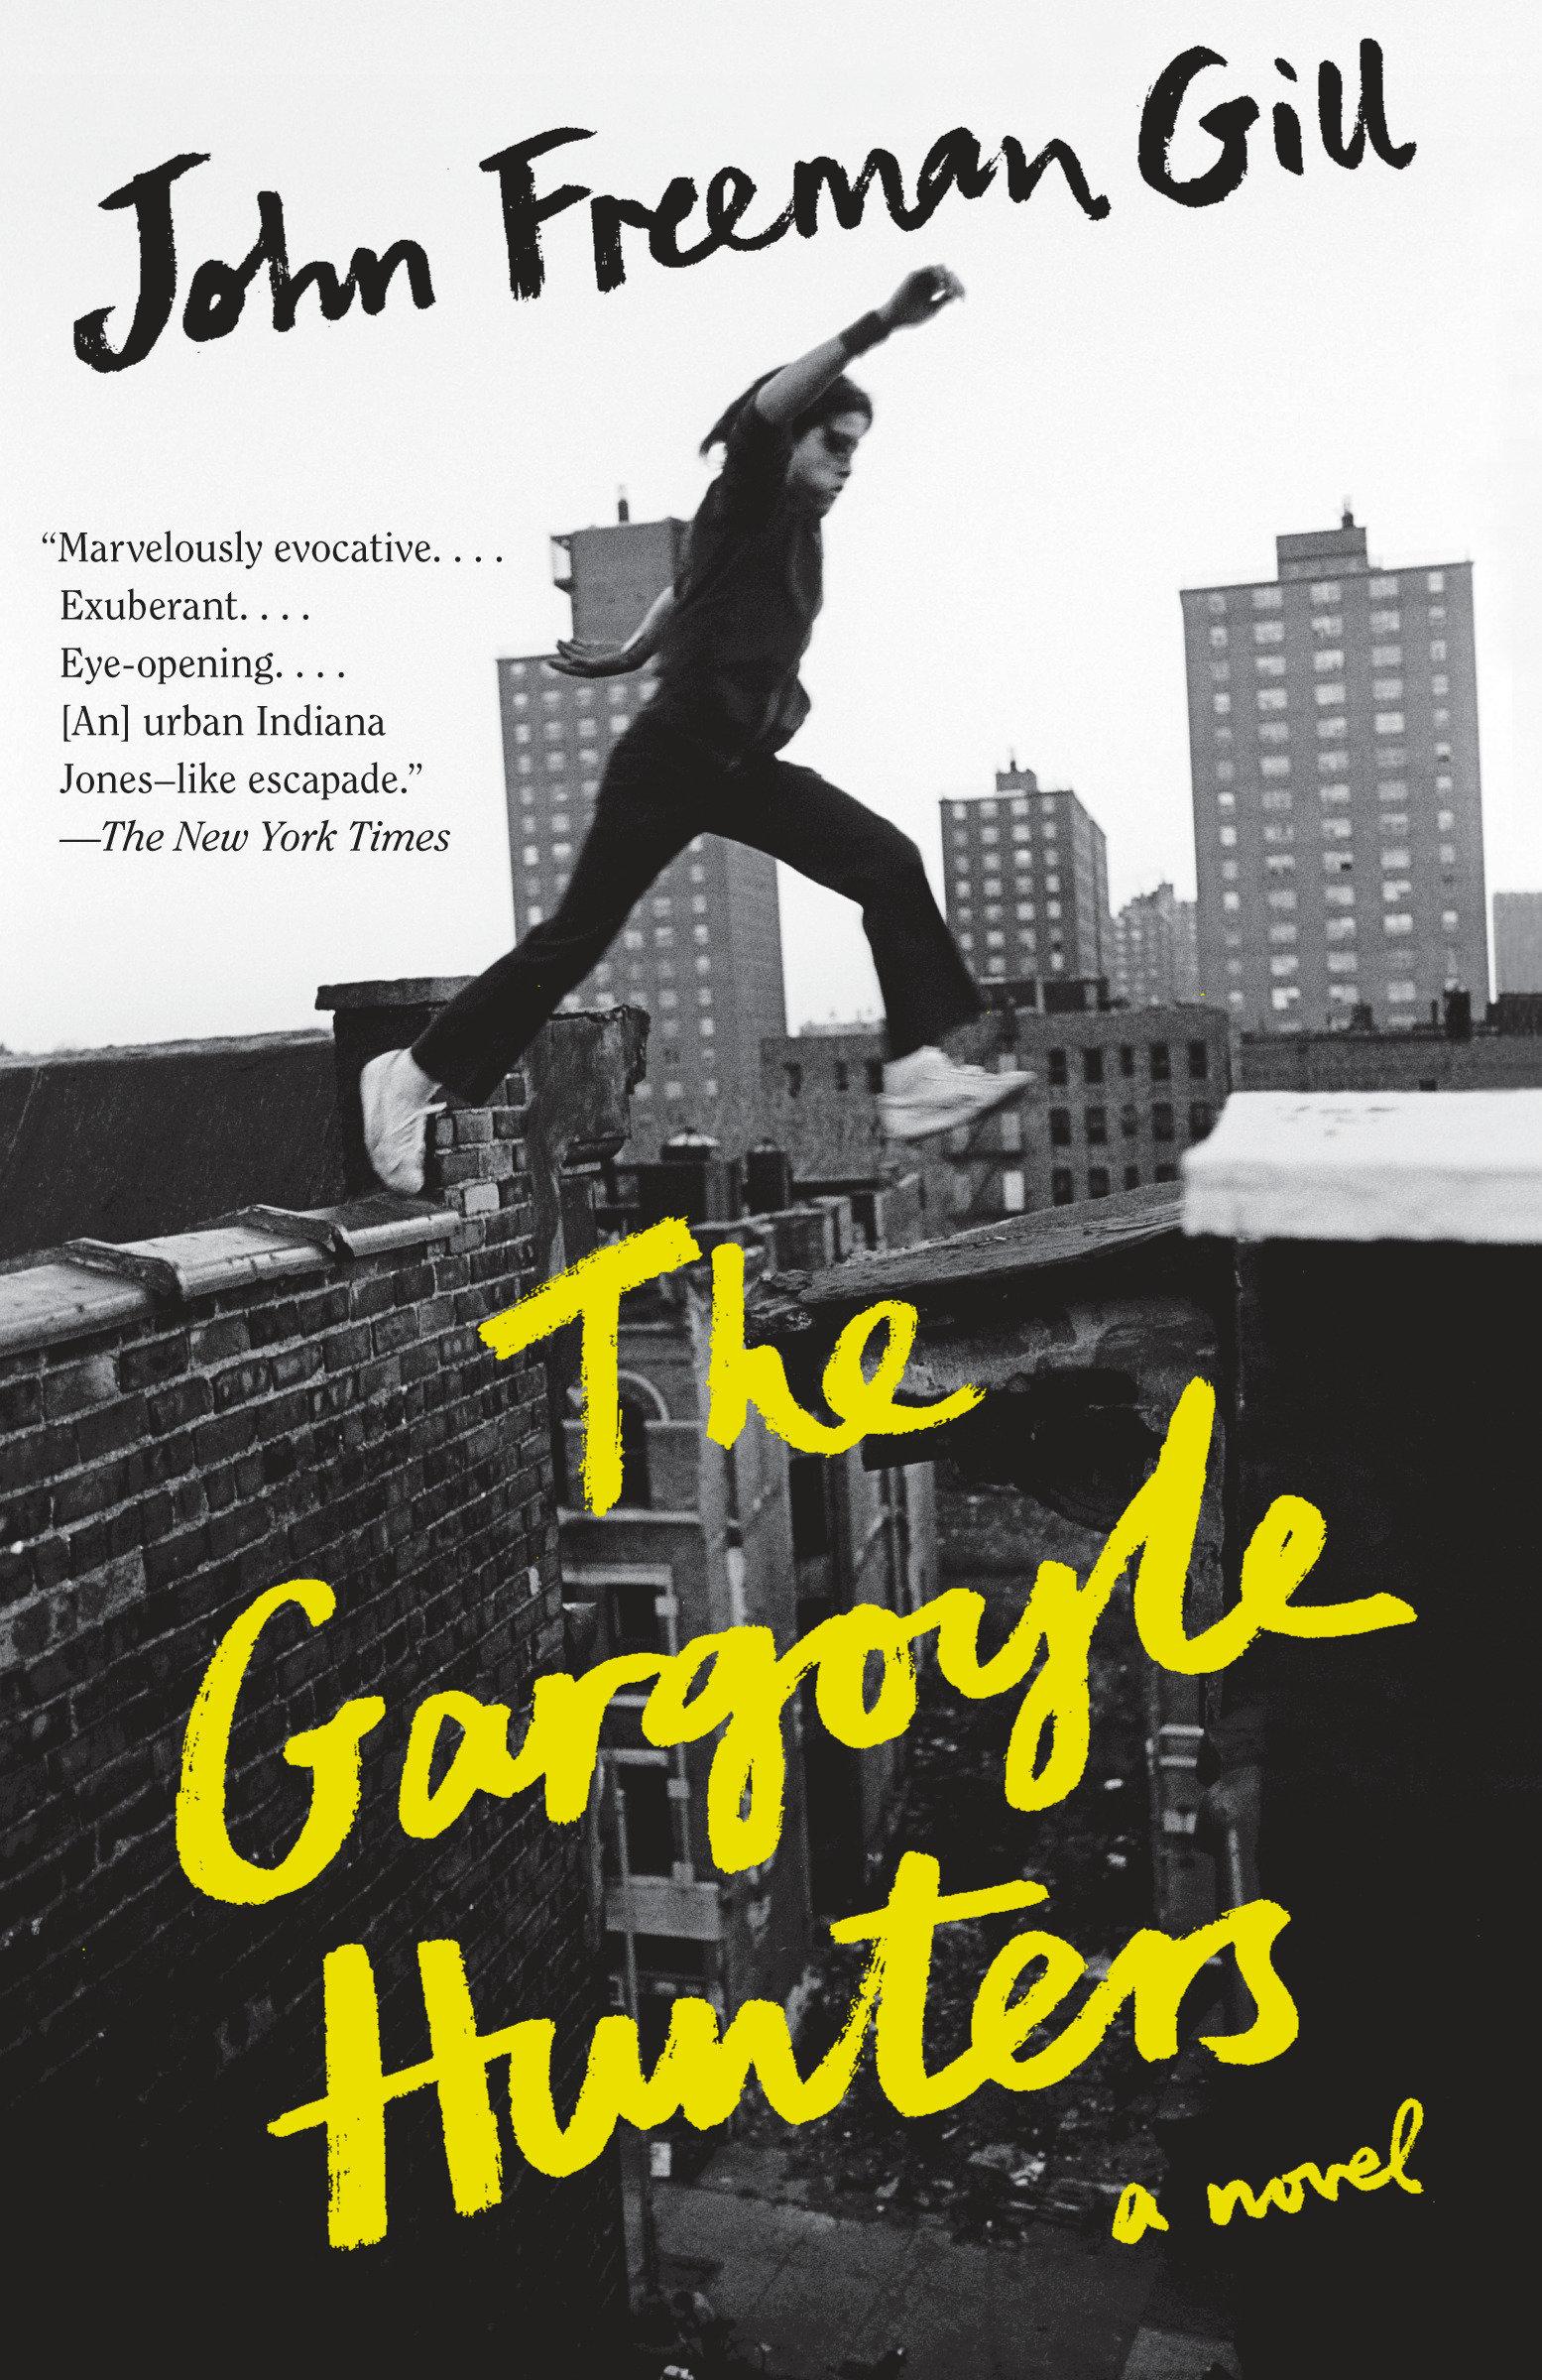 The Gargoyle Hunters A novel